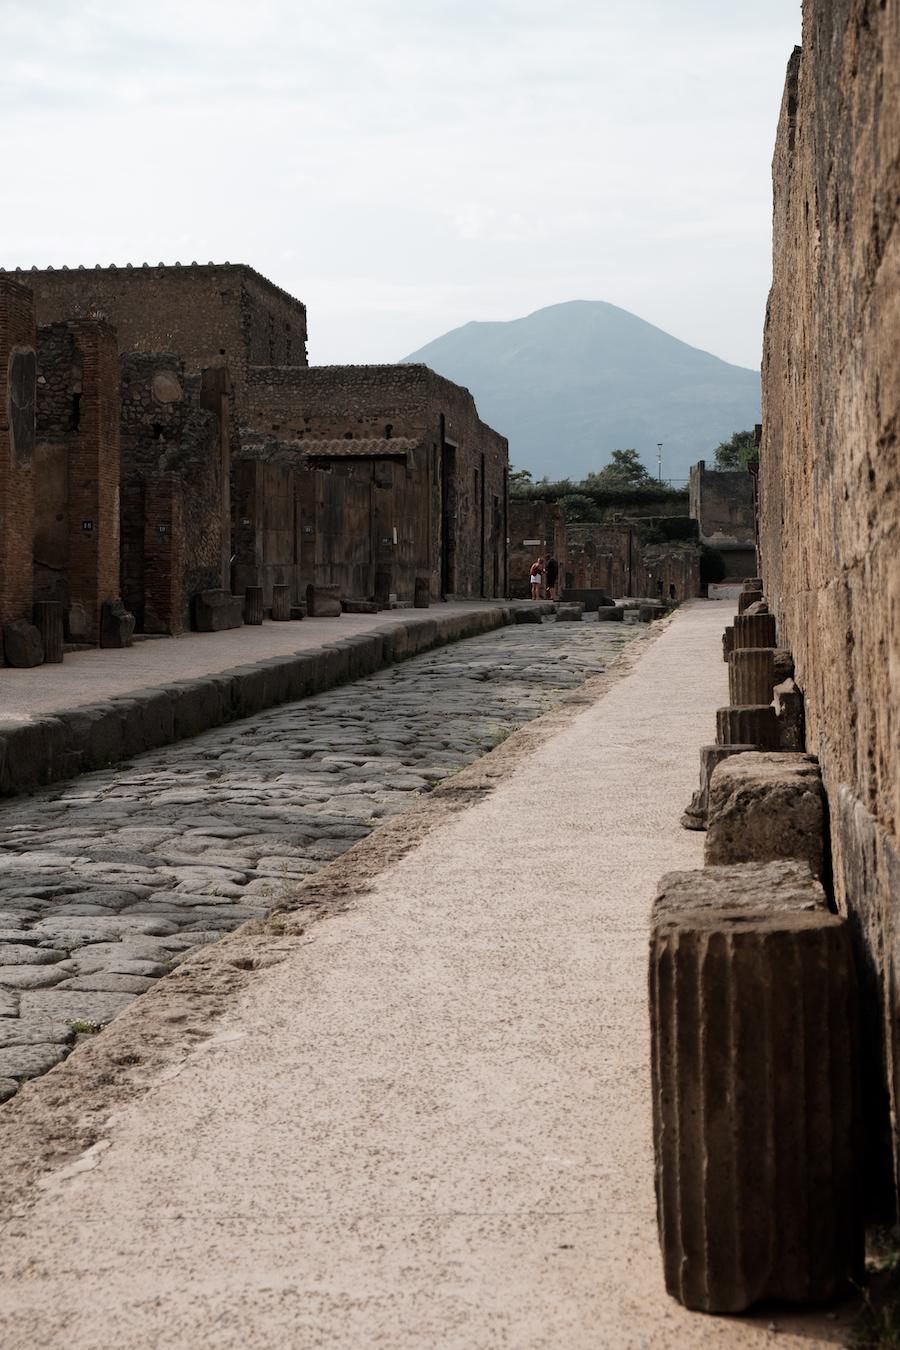 Vesuvius and Pompeii - by Ben Holbrook